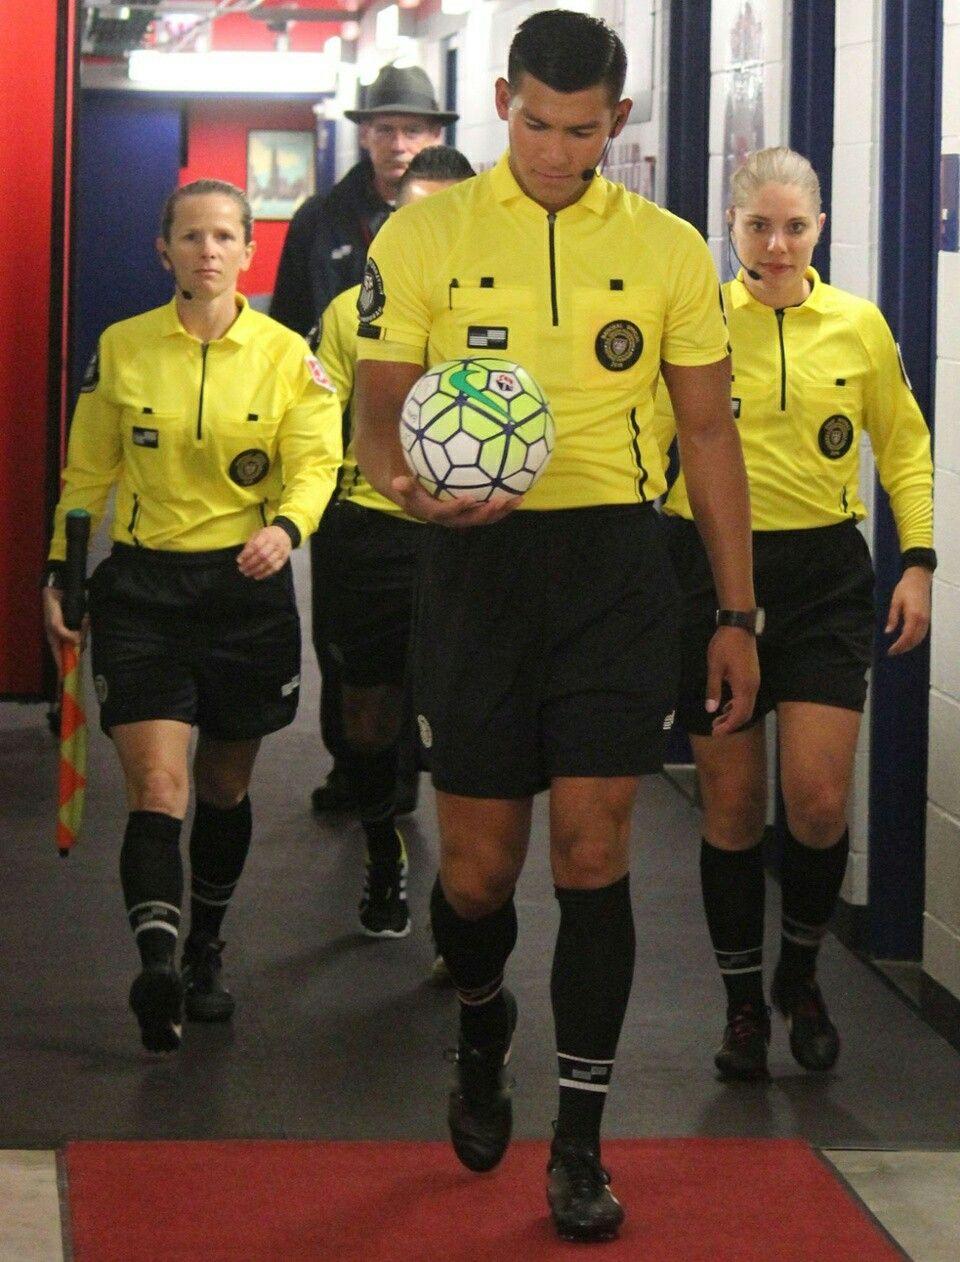 72950123f New USSF referee uniform Referee Uniforms